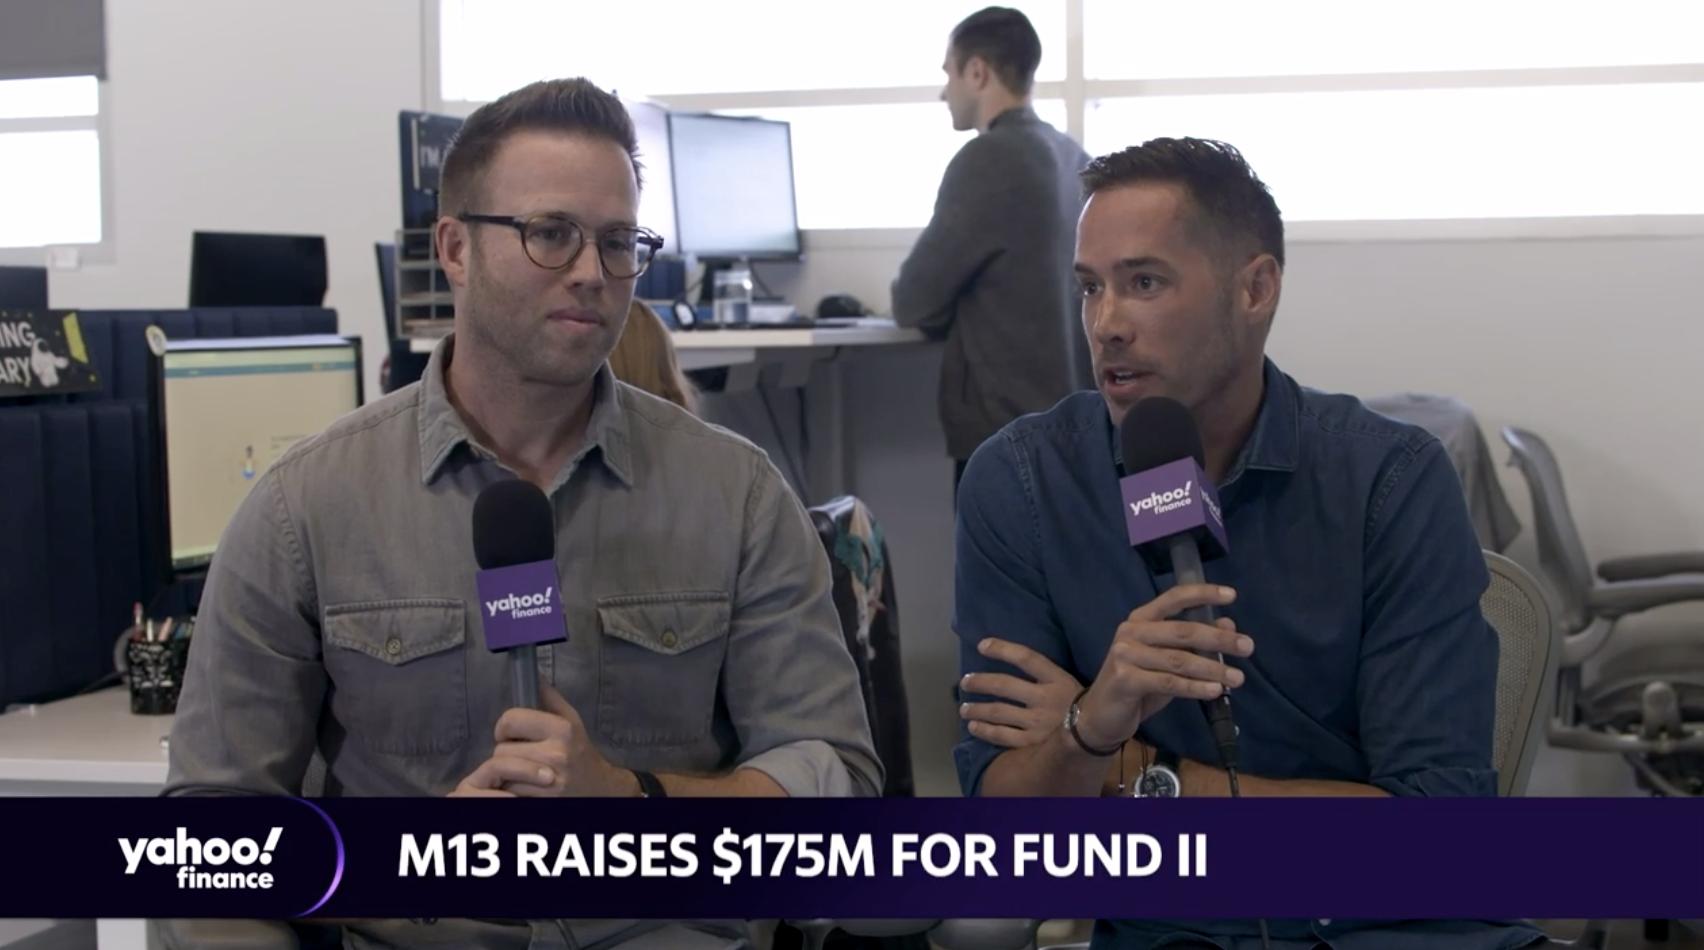 Los Angeles venture firm M13 raises $175 million for second fund